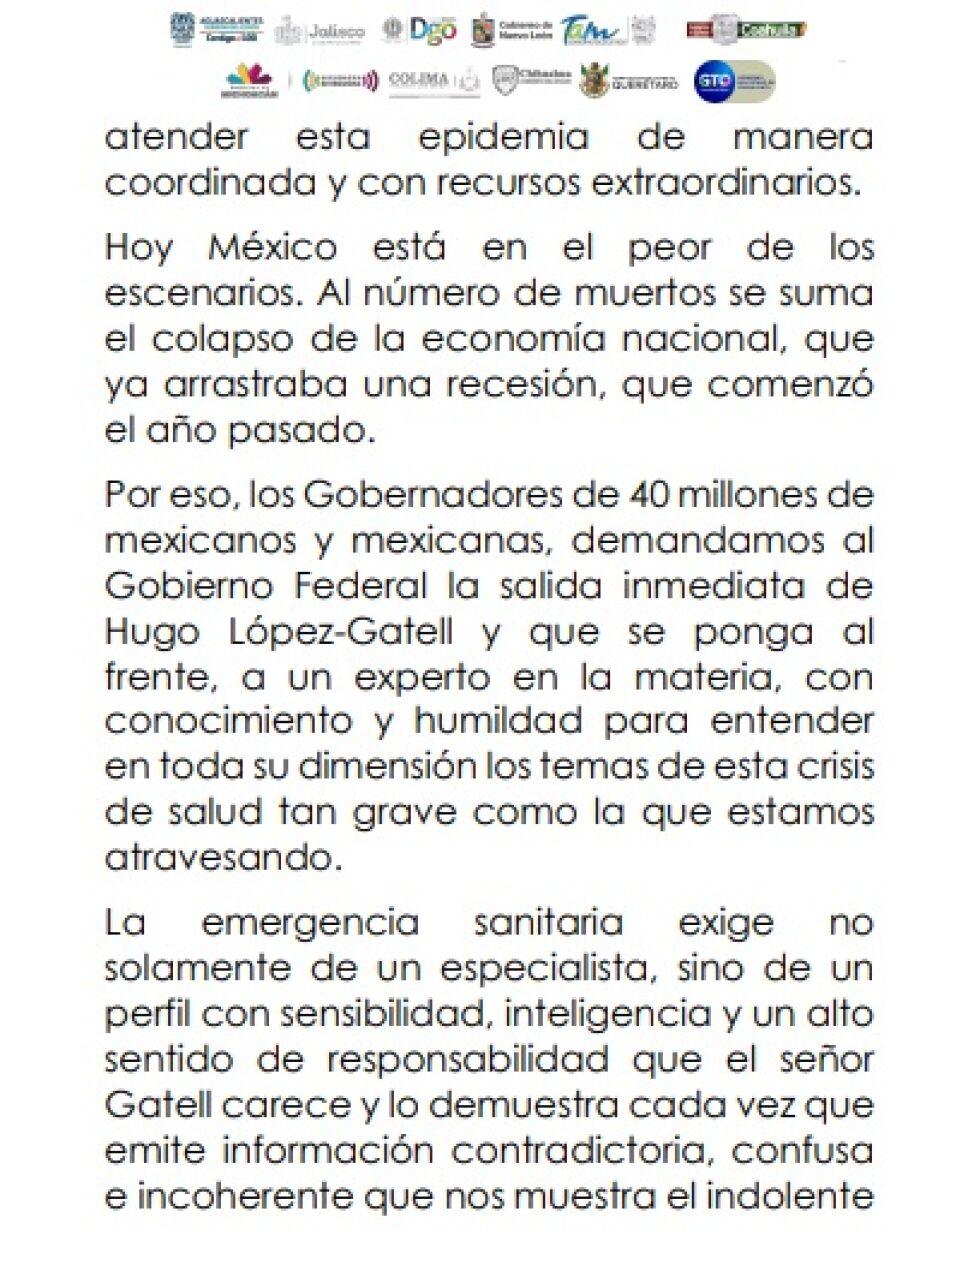 Exigen gobernadores renuncia inmediata de López-Gatell (4)